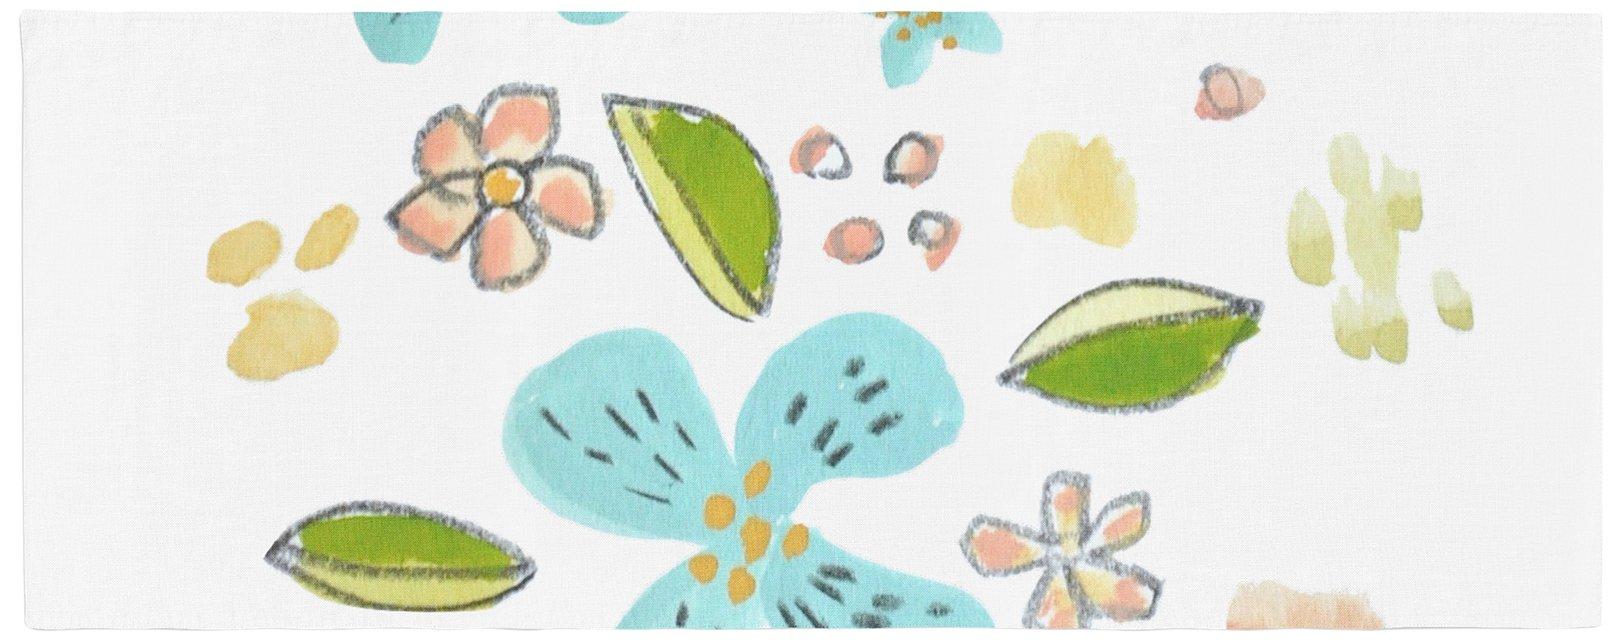 Kess InHouse JR1030ABR01 Jennifer Rizzo Happy Flower Dance Blue Green Floral Bed Runner, 34'' x 86''